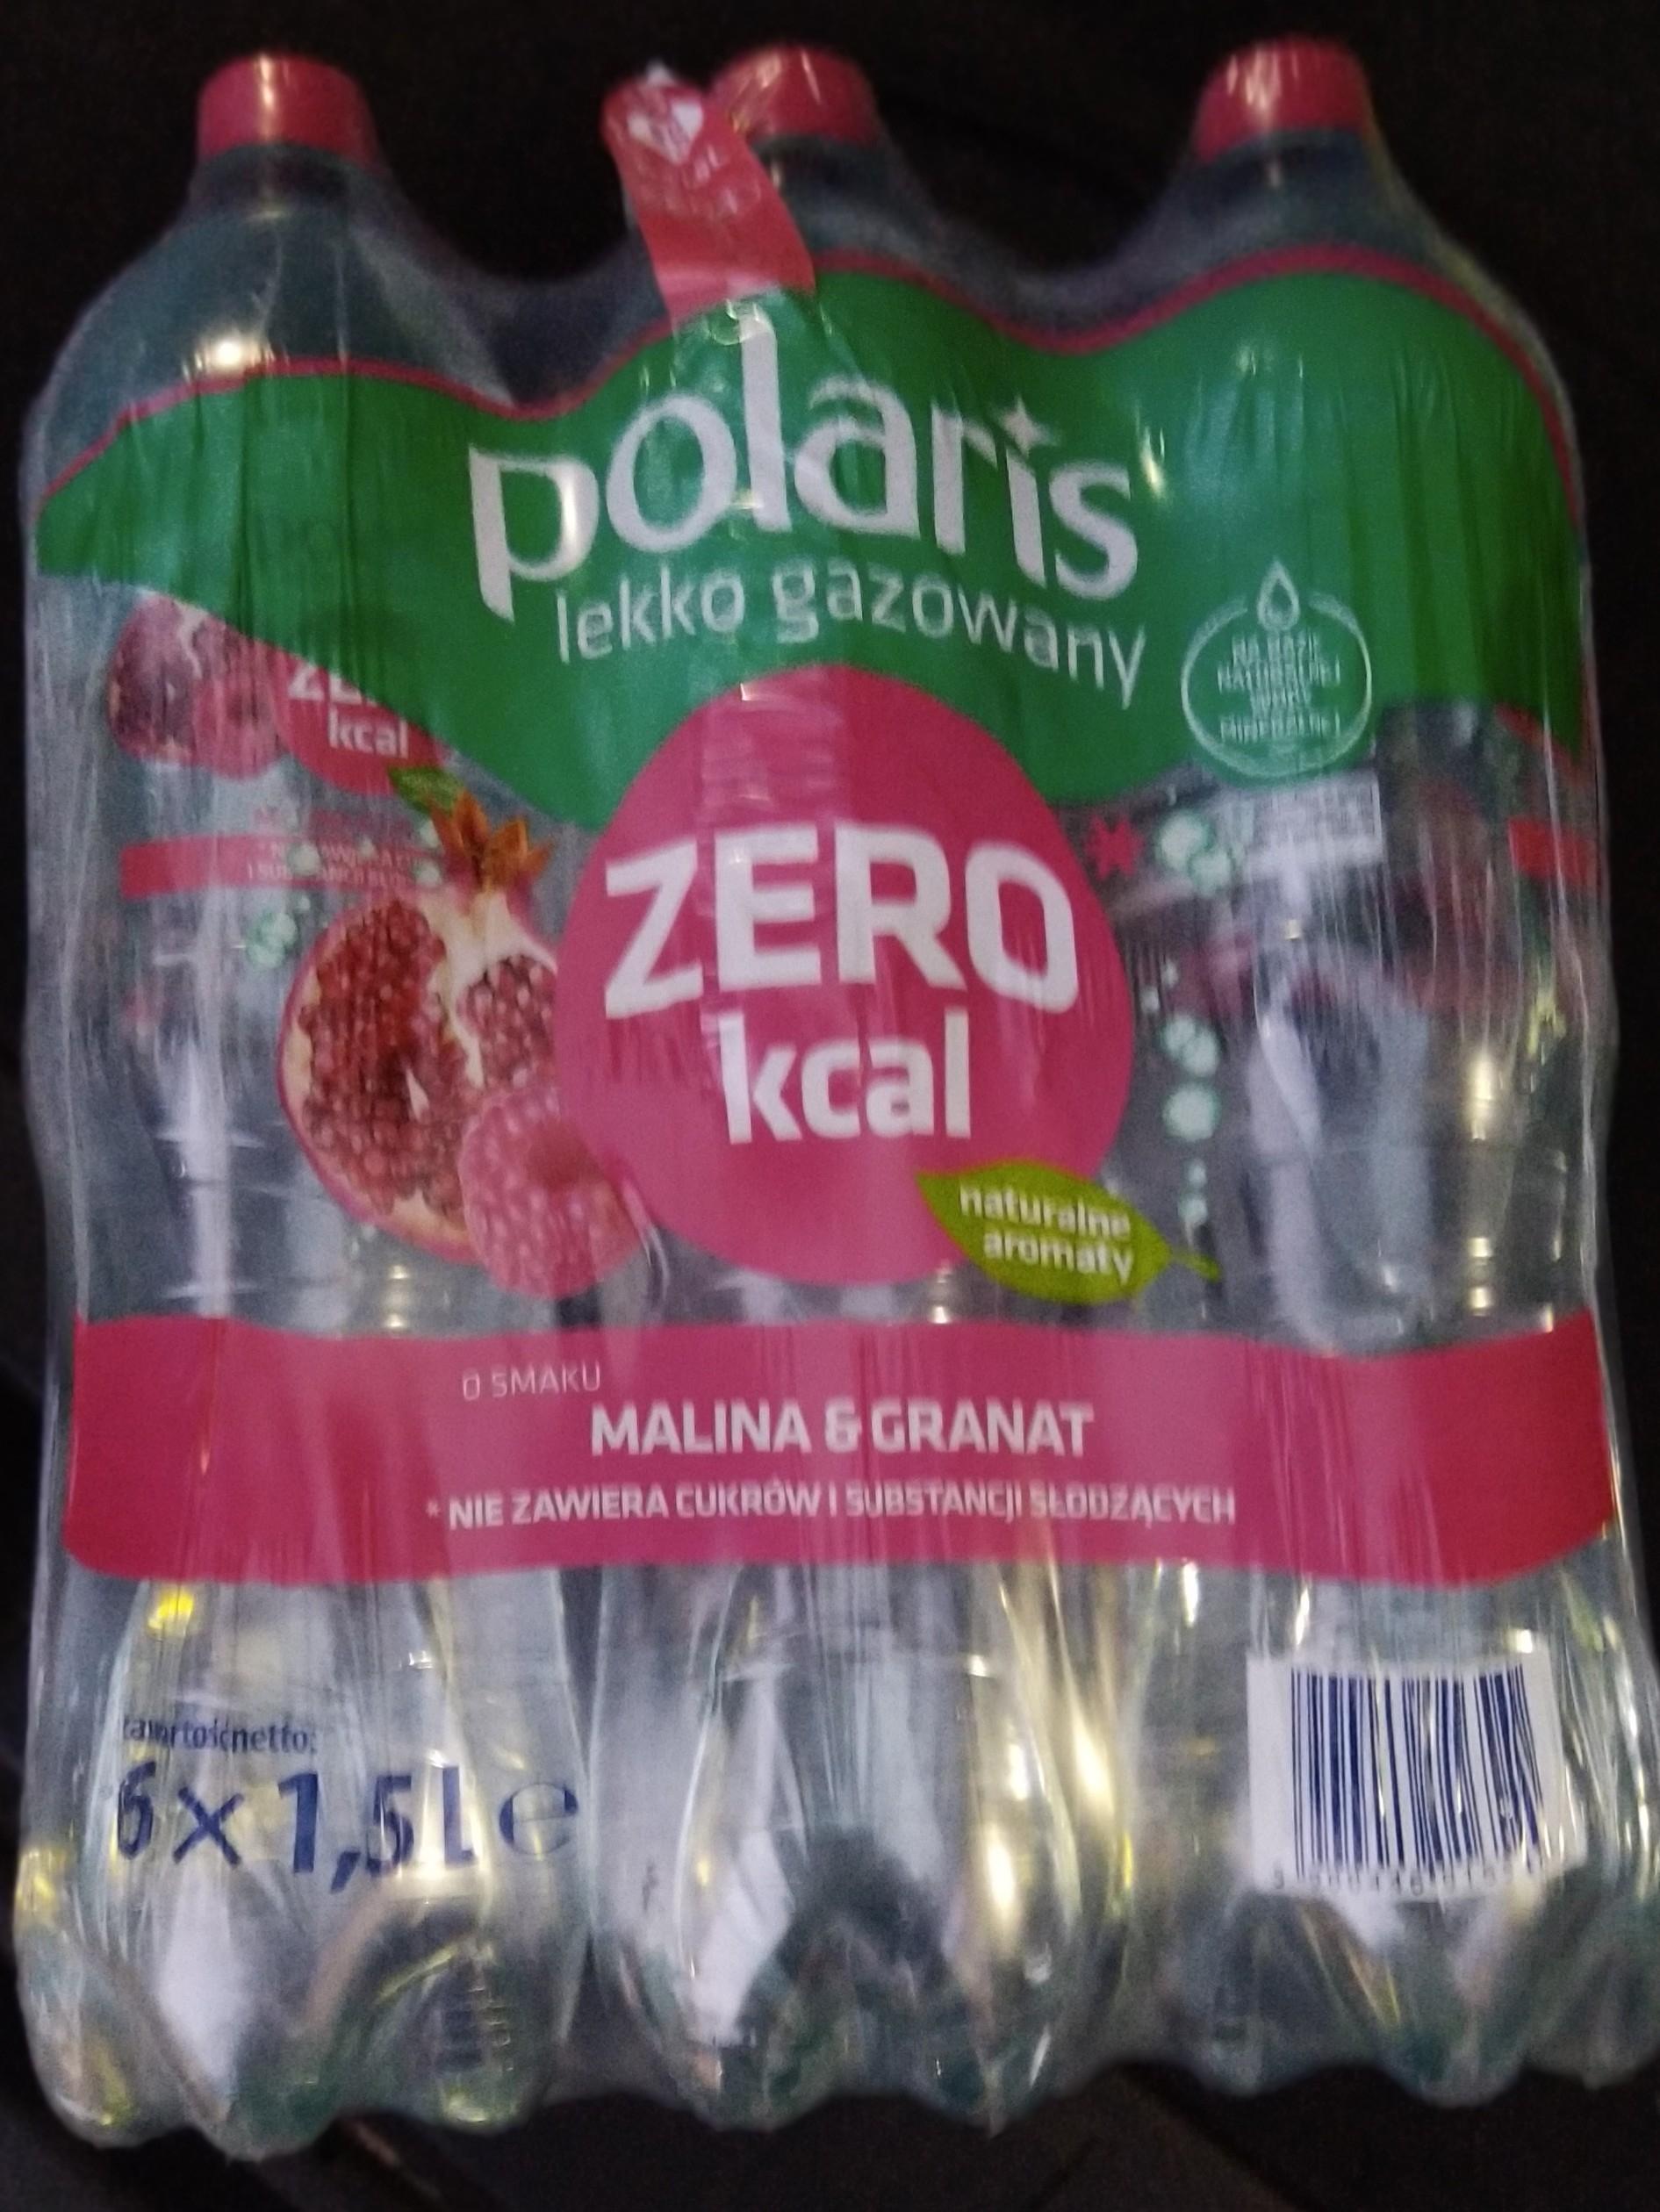 Woda Polaris 0 kcal malina granat lekko gazowana @Biedronka